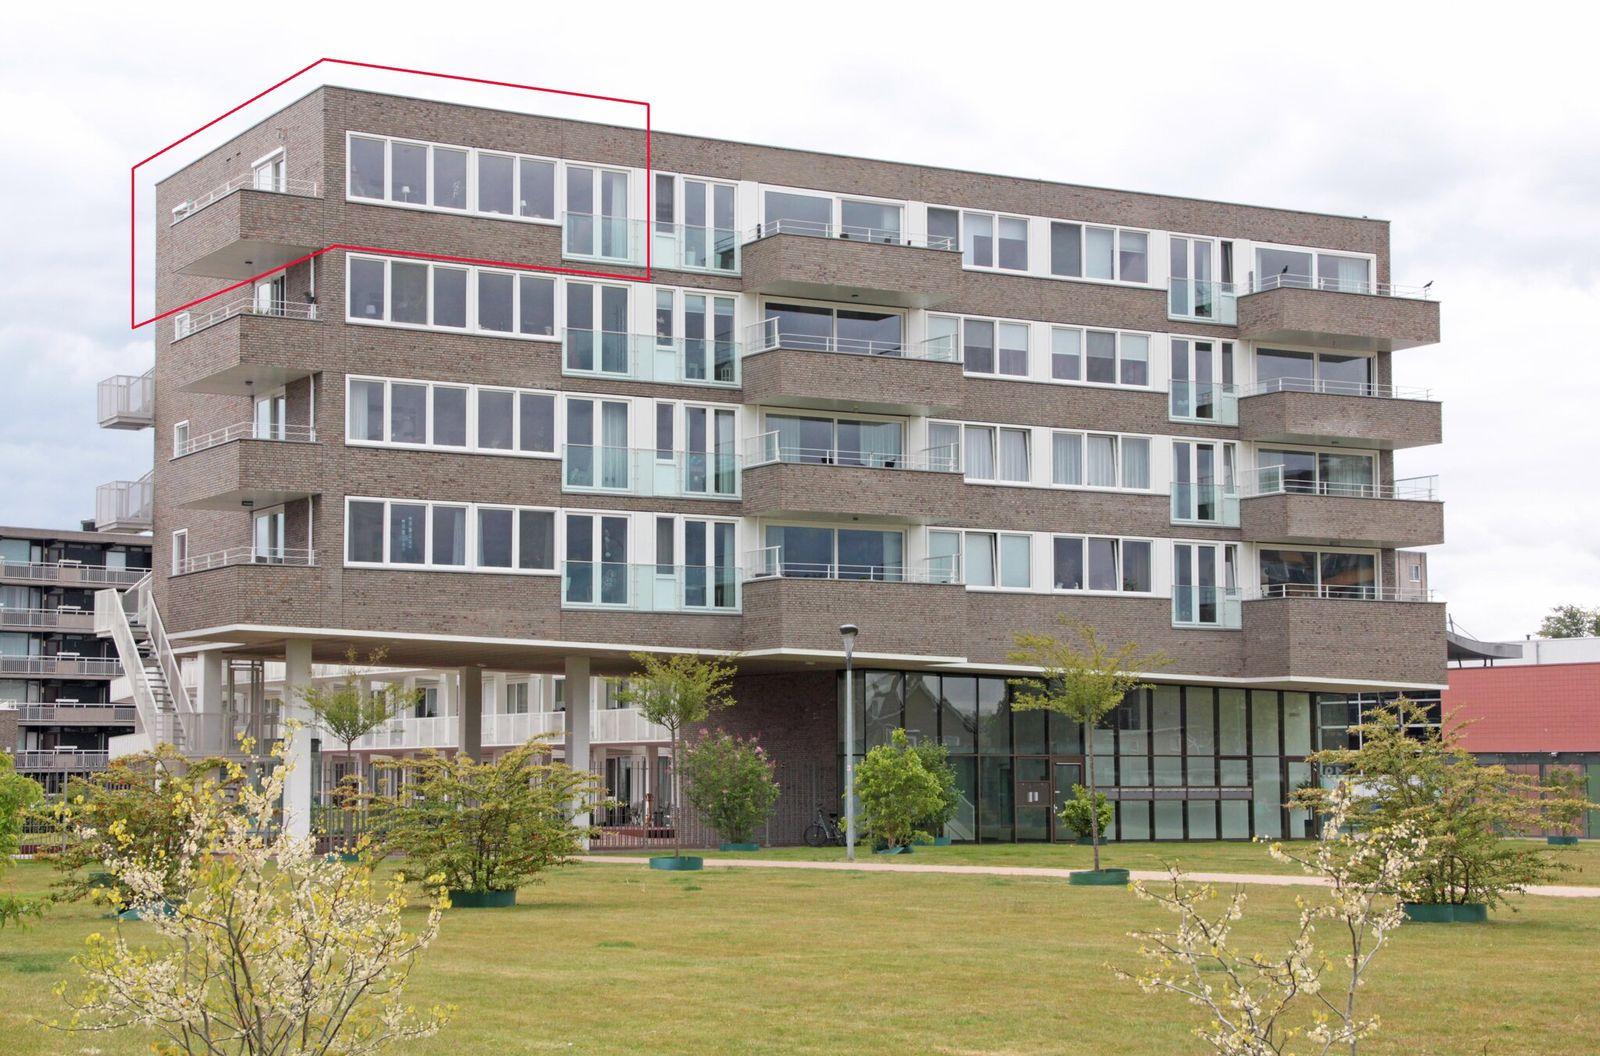 Kaaplaantje 19-54, Hoogeveen